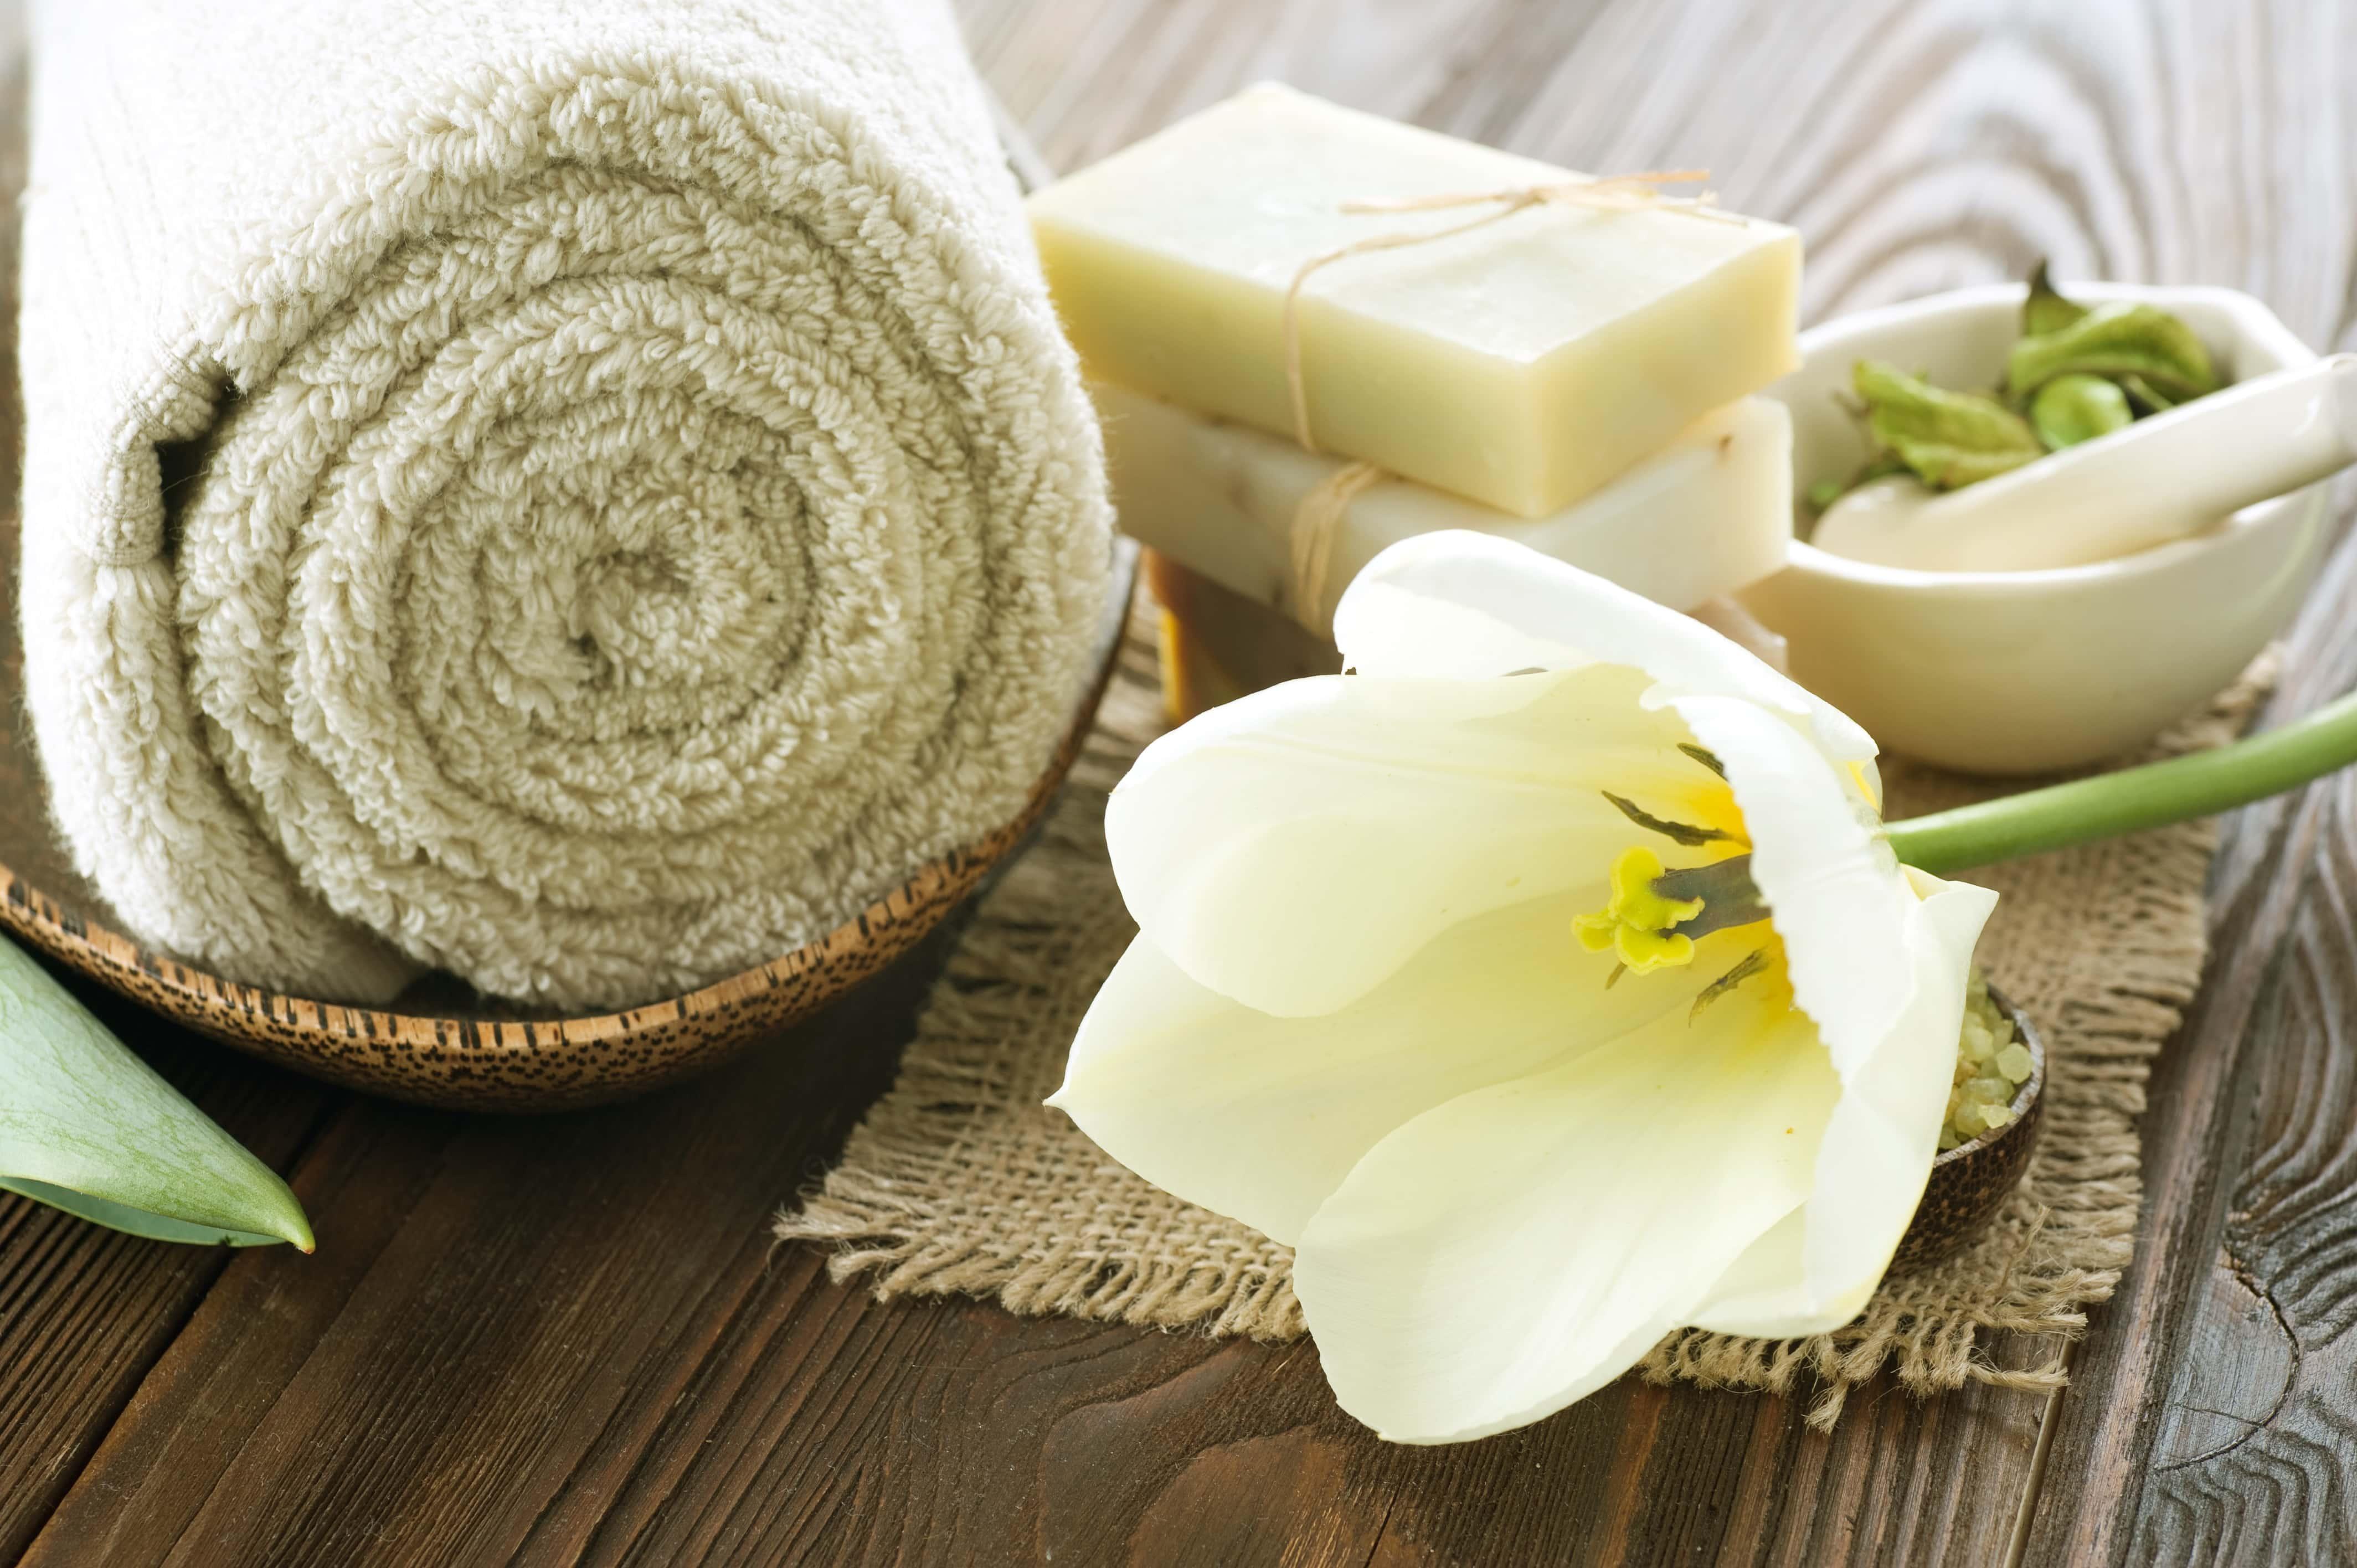 bath towel, soap, flower